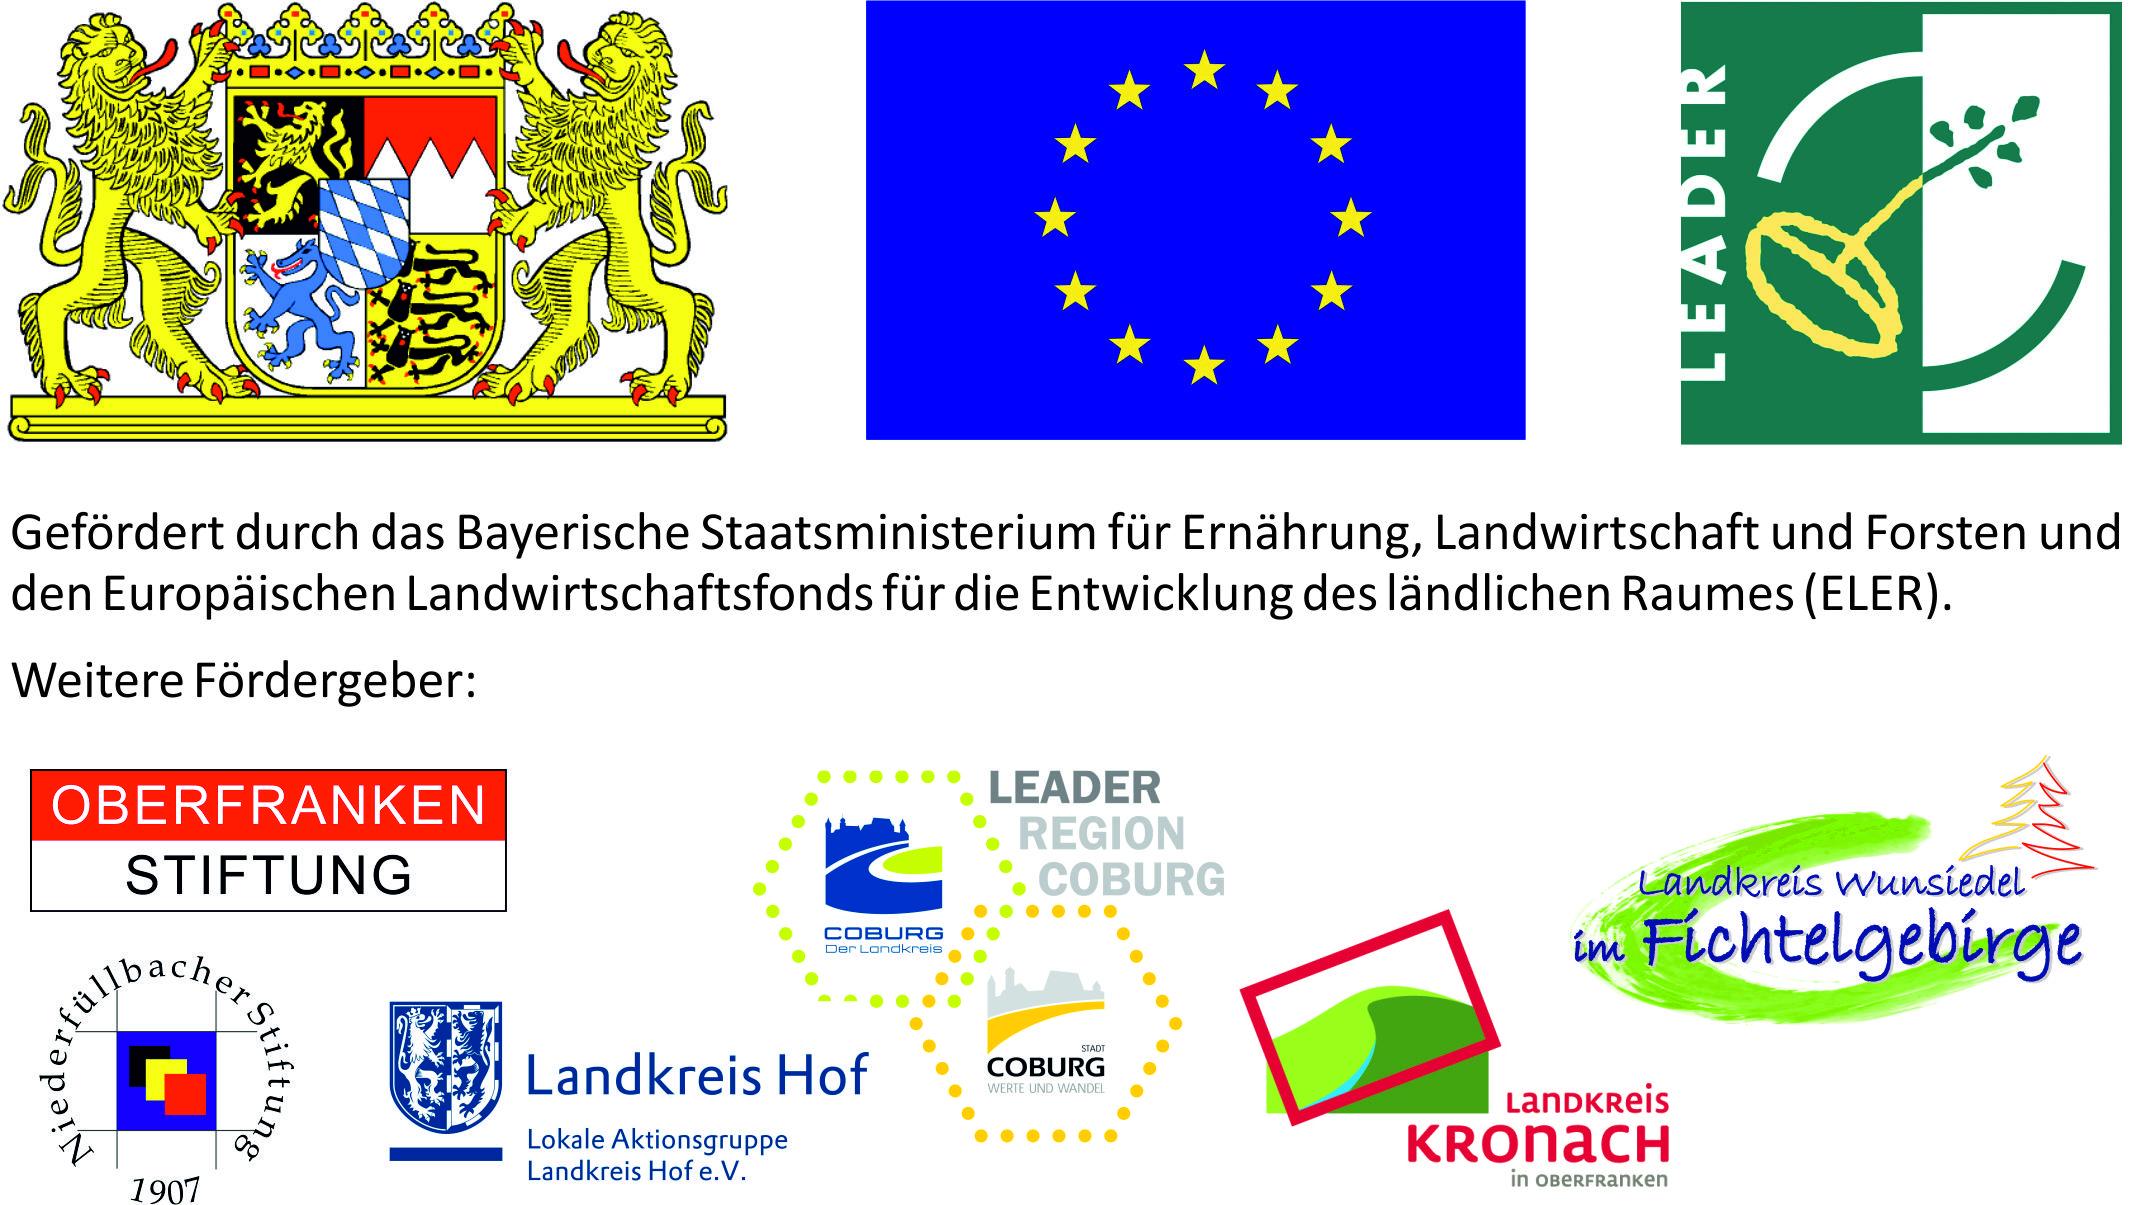 http://www.energie-frankenwald.de/cimages/Logos-Gross-Klimaprojekt.jpg